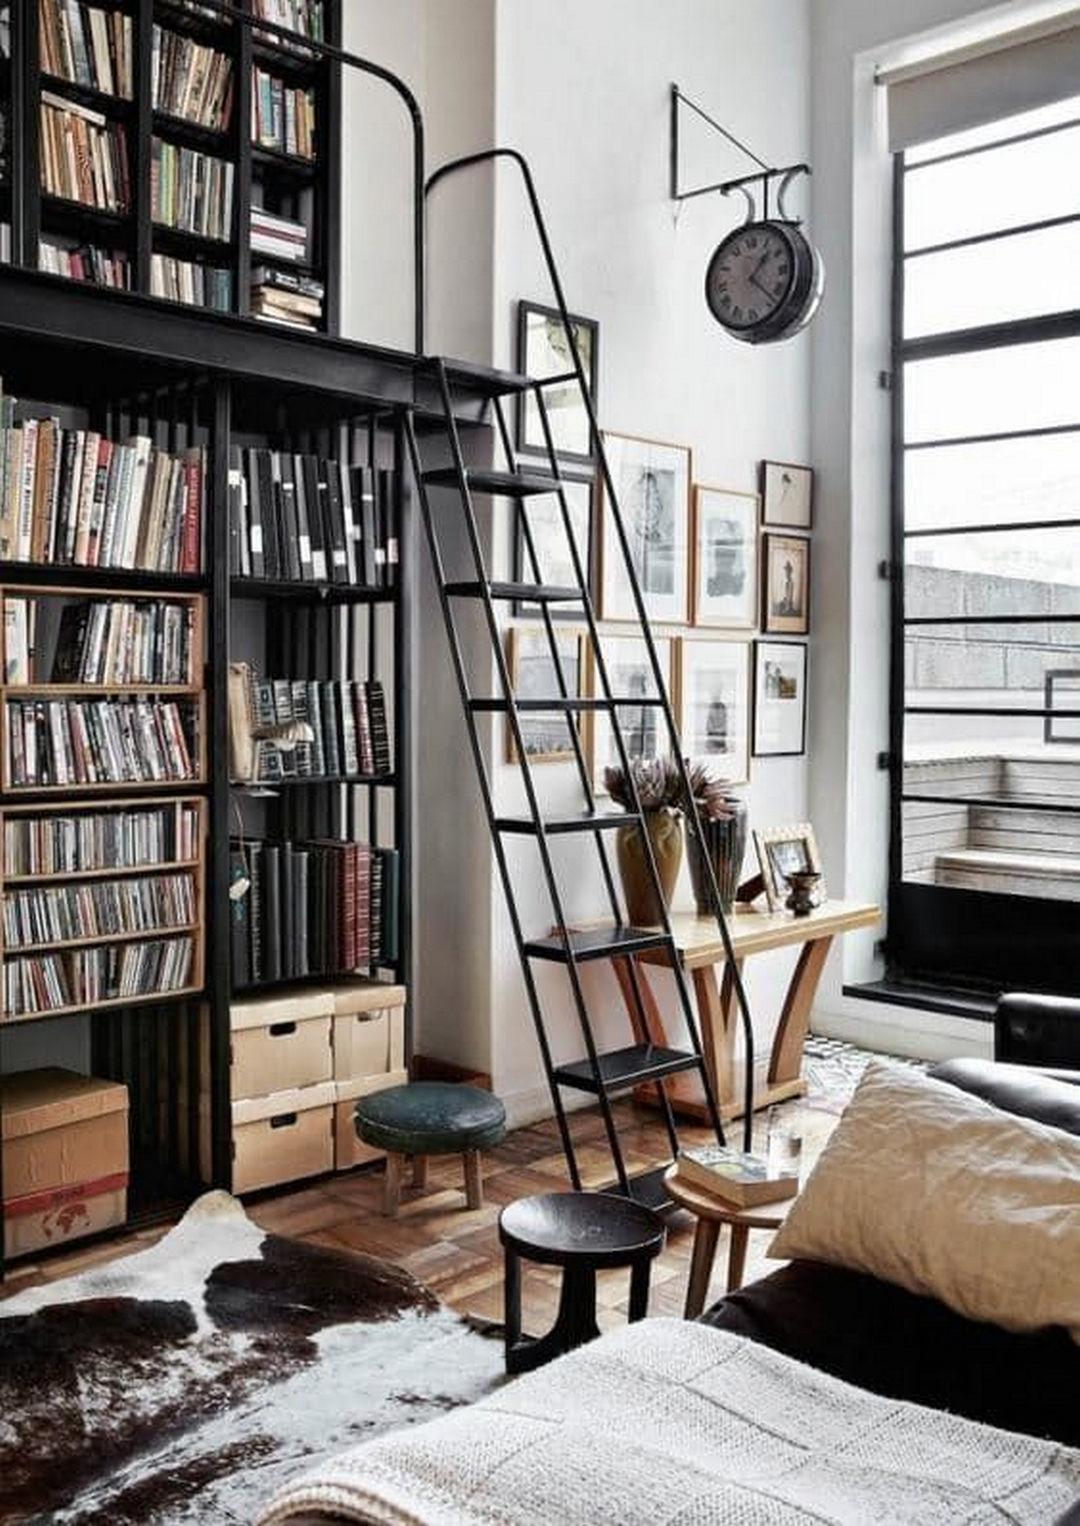 81 Cozy Home Library Interior Ideas Gorgeous Interior Ideas Cozy